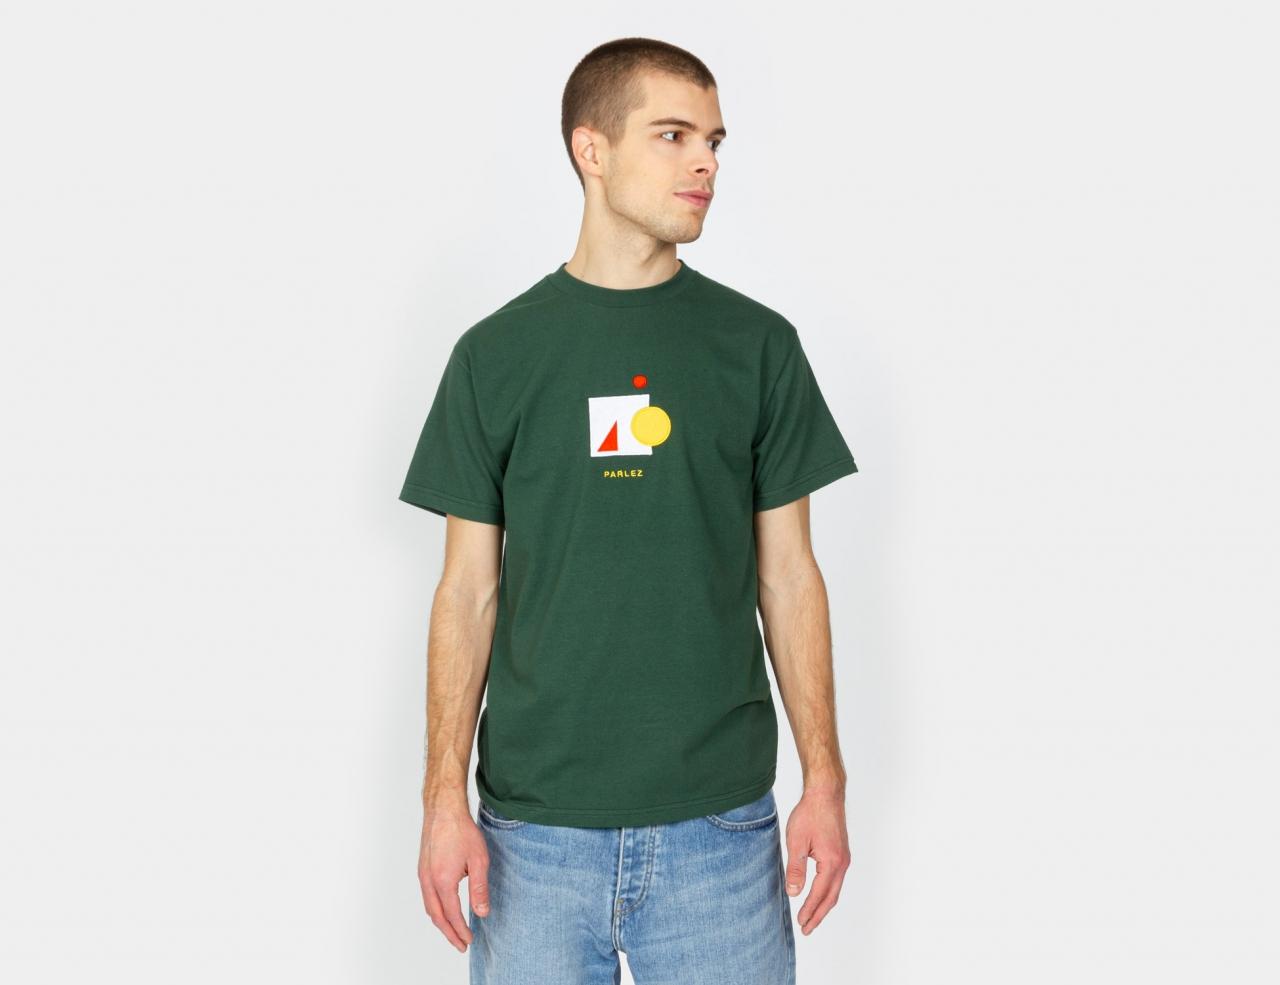 Parlez Saintes Shirt - Forest